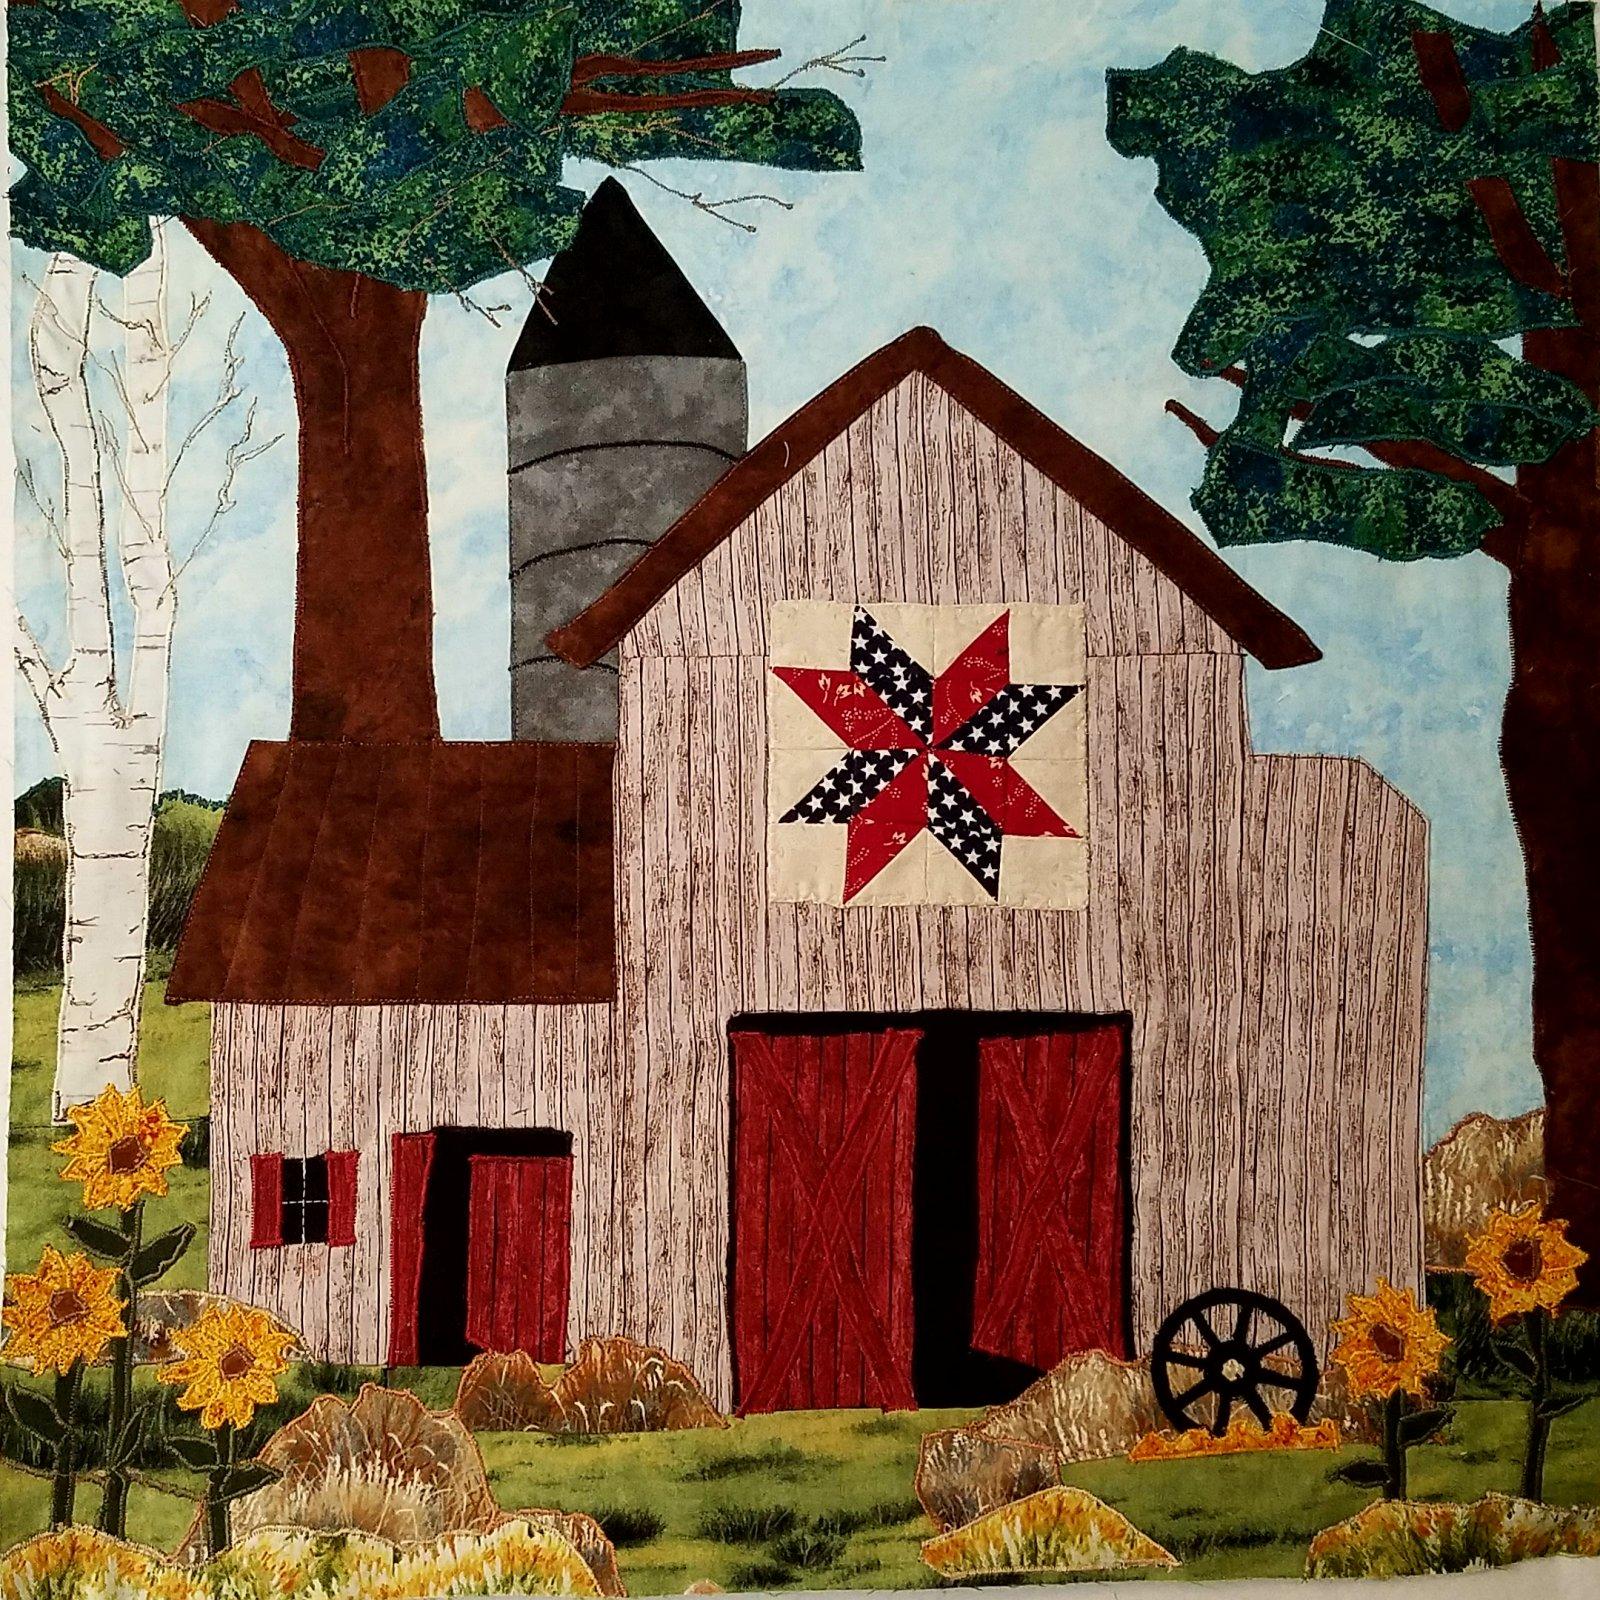 Glenda's Brown Barn